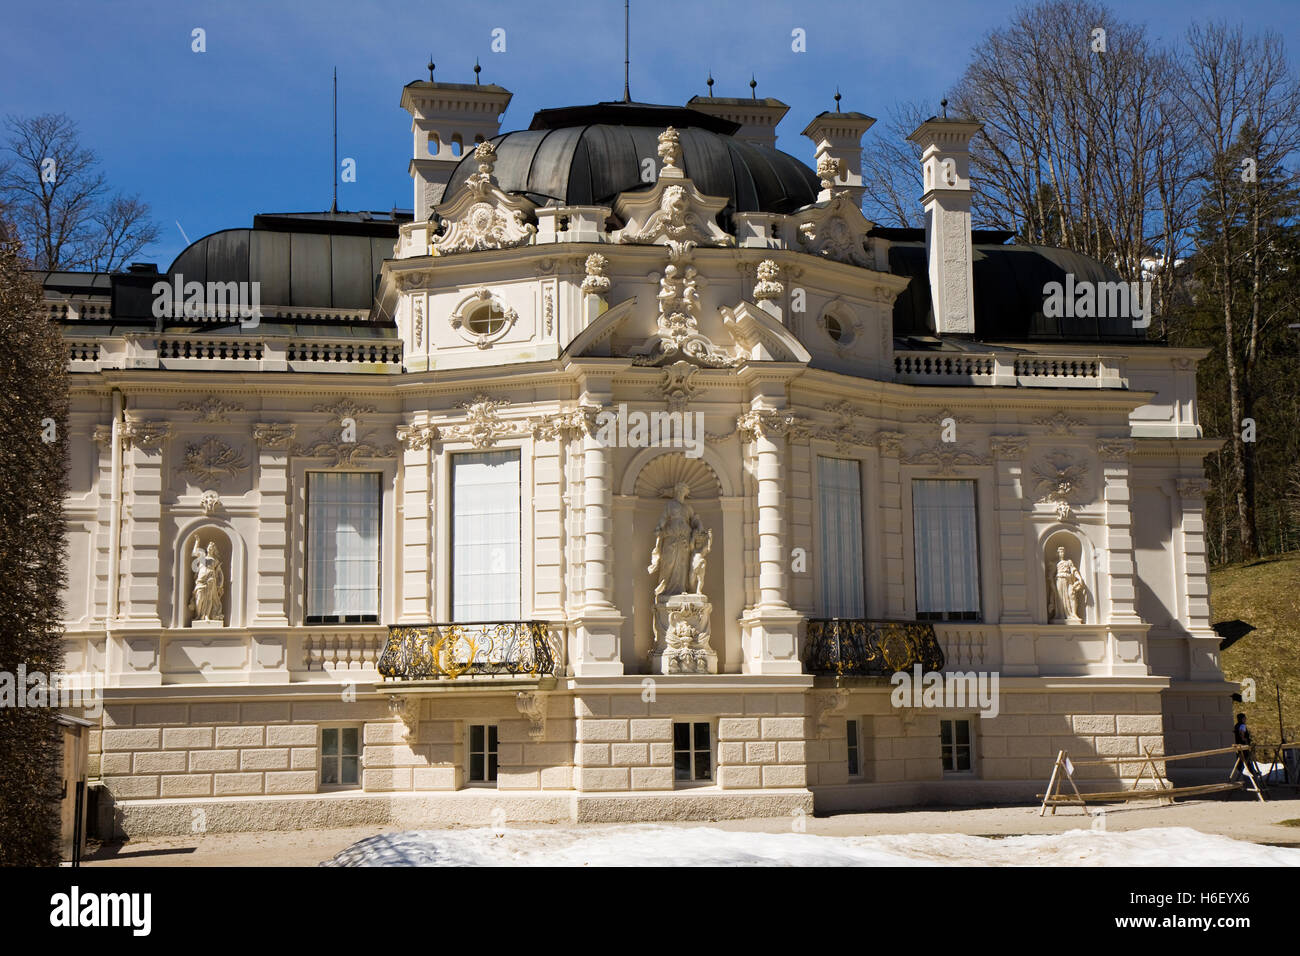 linderhof caste in bavaria germany - Stock Image